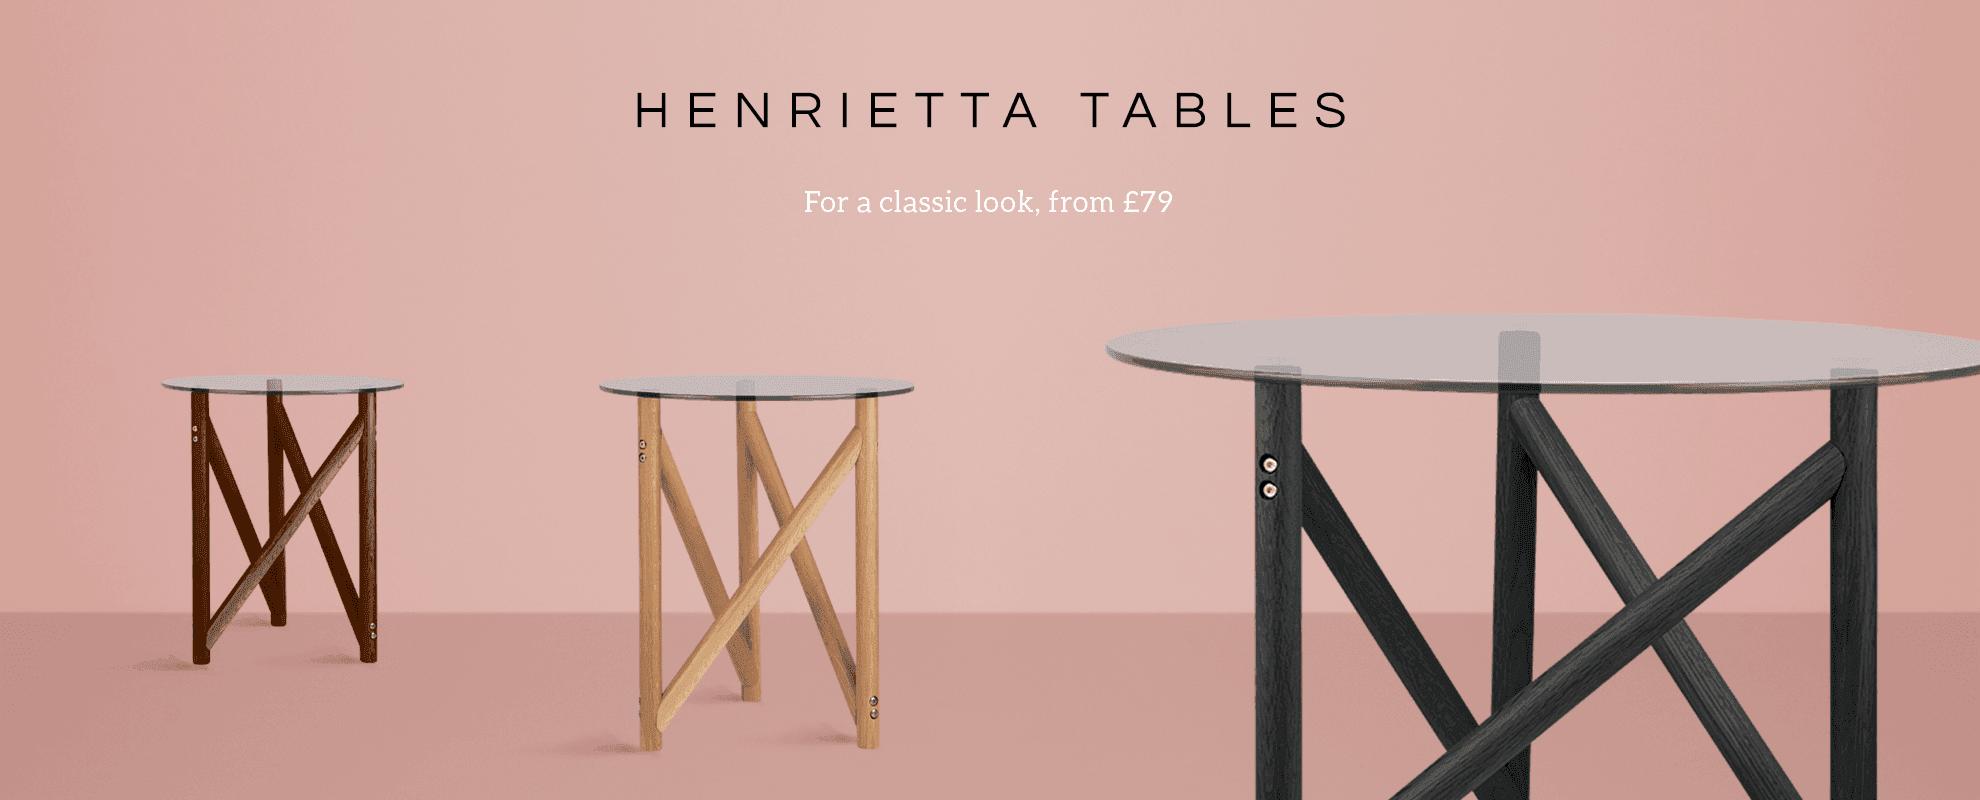 Henrietta Tables